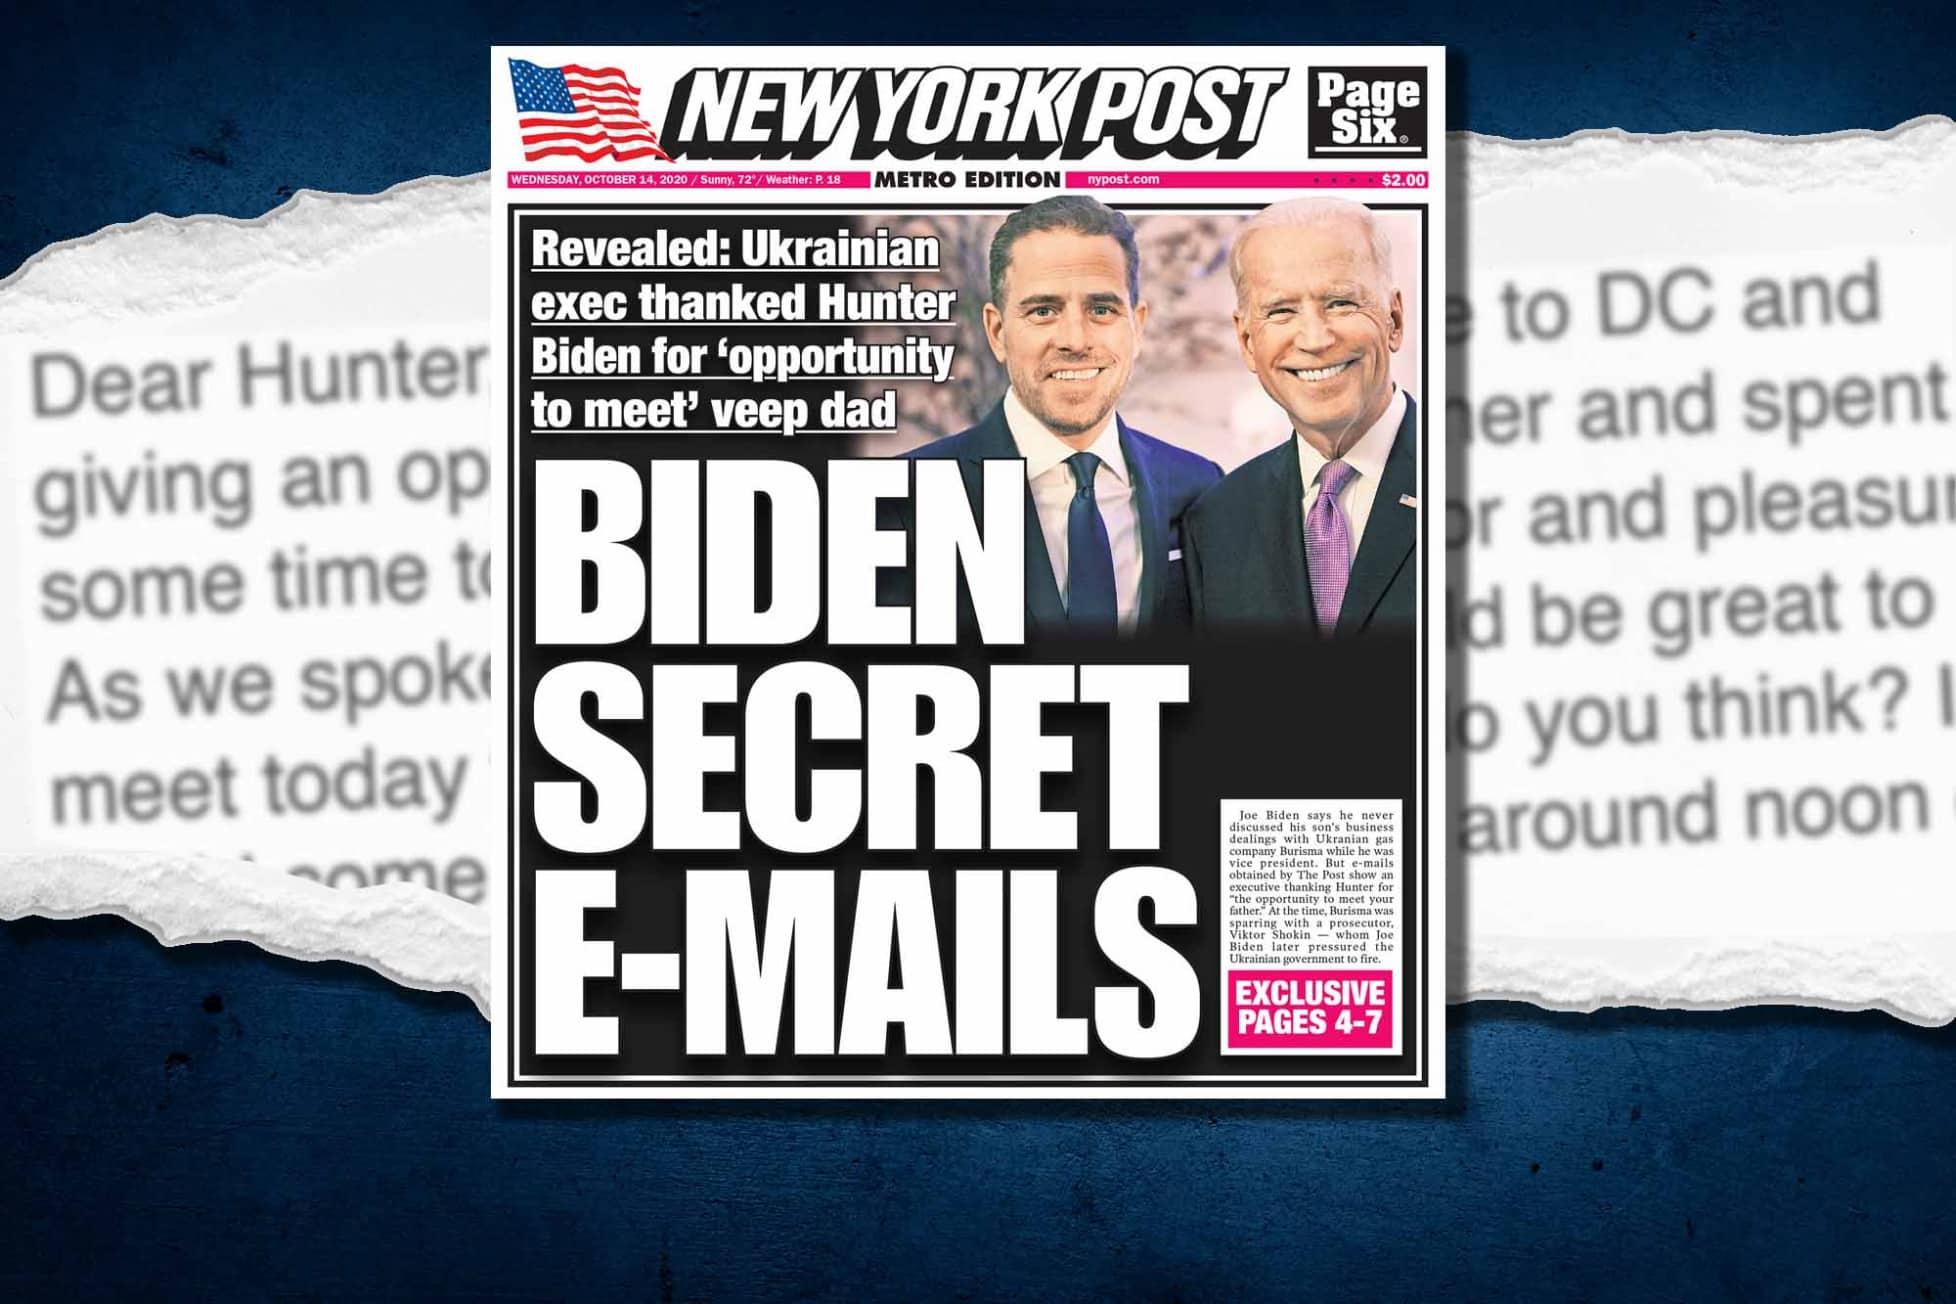 Hunter Biden Secret Burisma Emails, NY Post